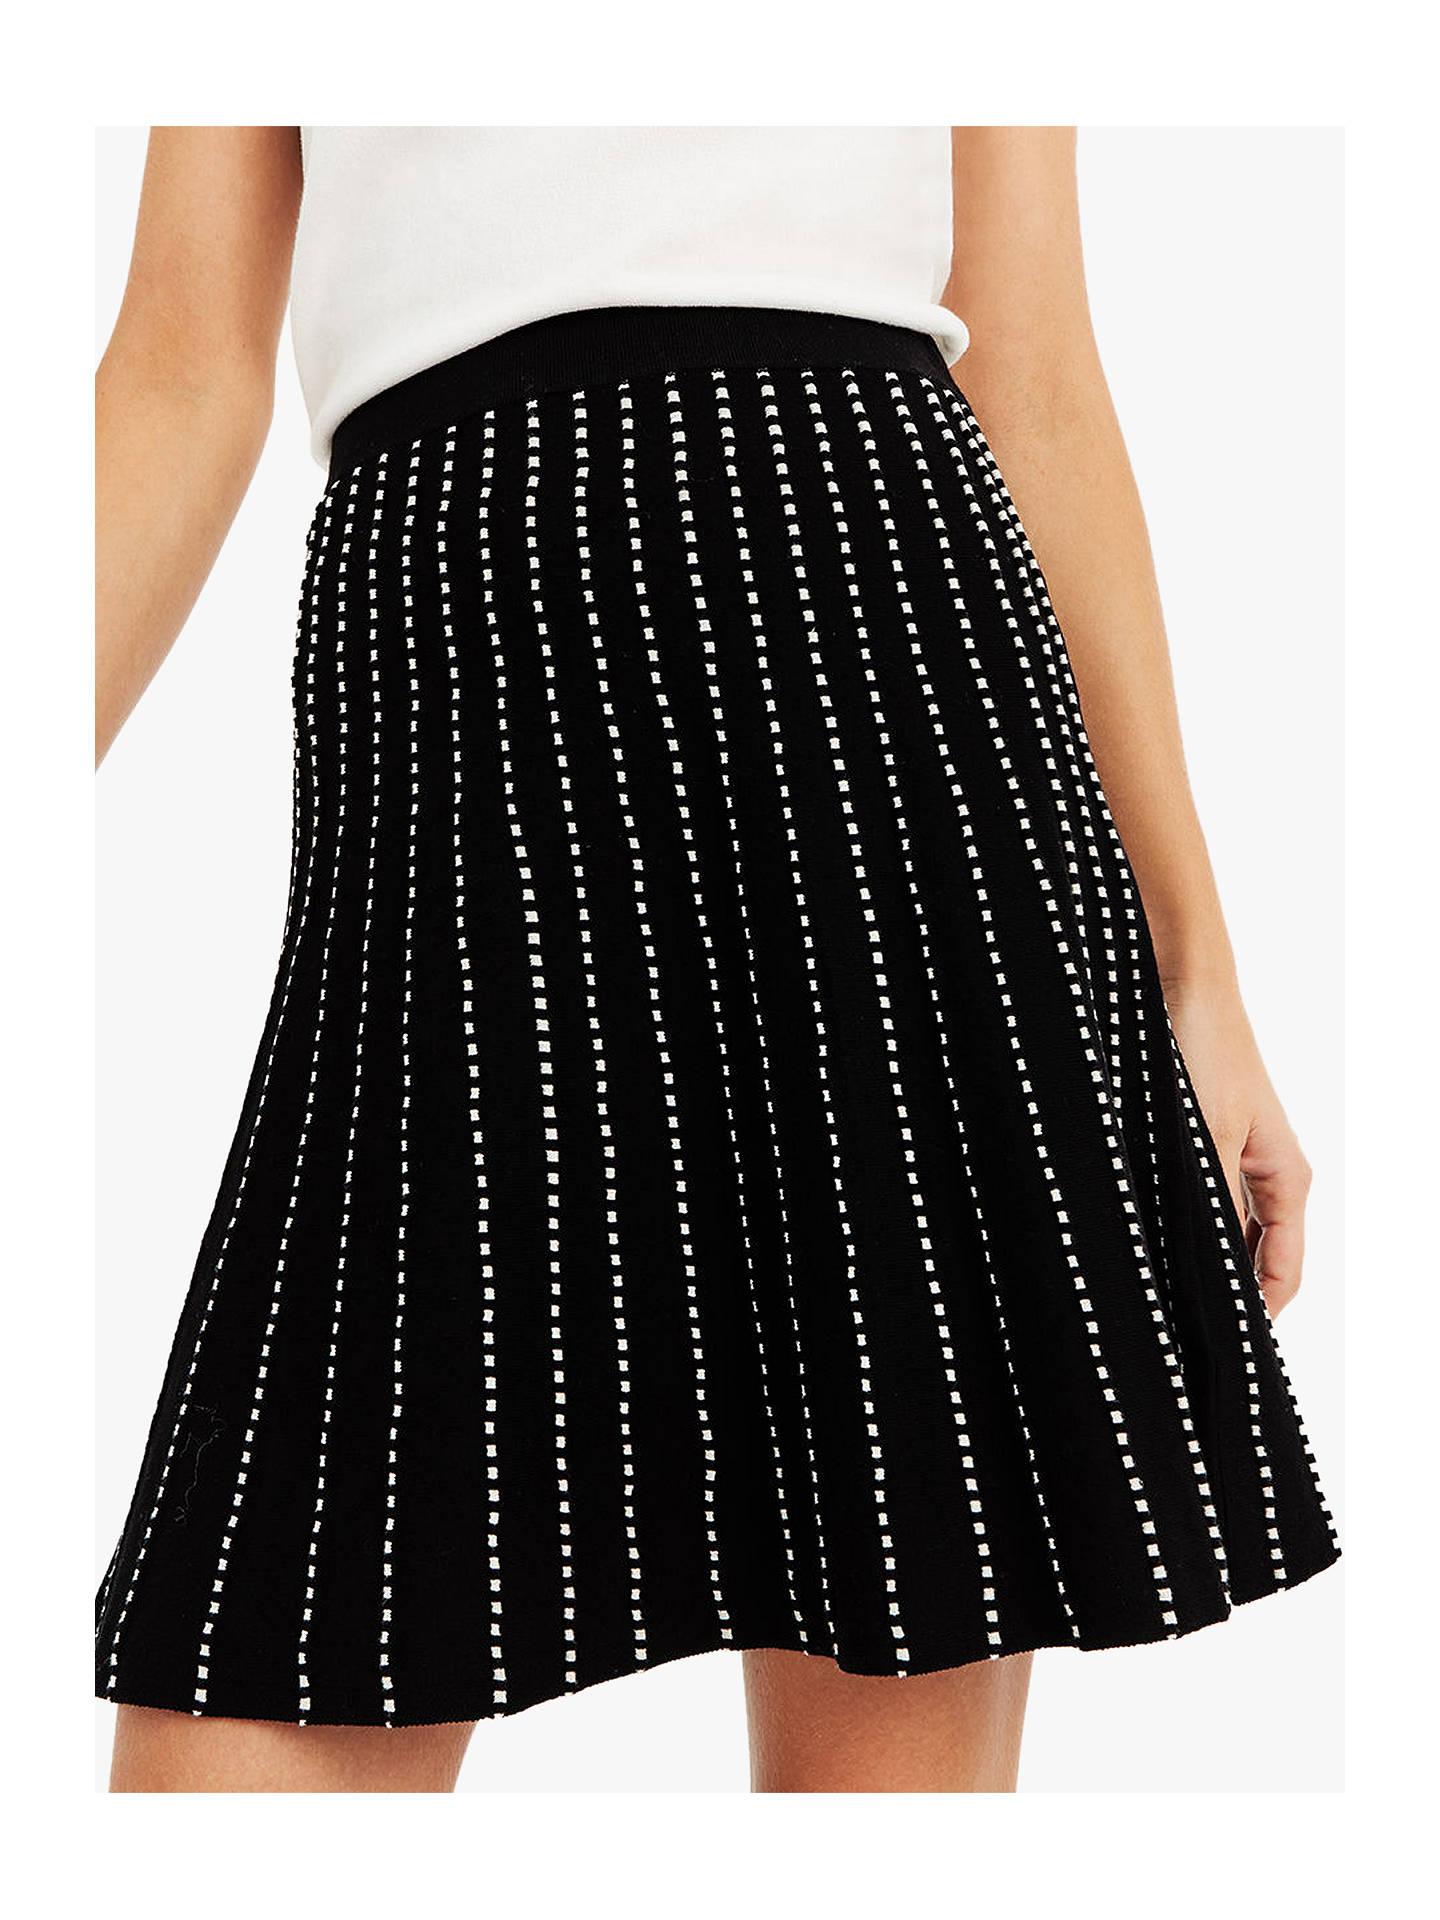 ead9fc90595c Buy Oasis Julia Line And Dot Knitted Skirt, Black/White, S Online at ...